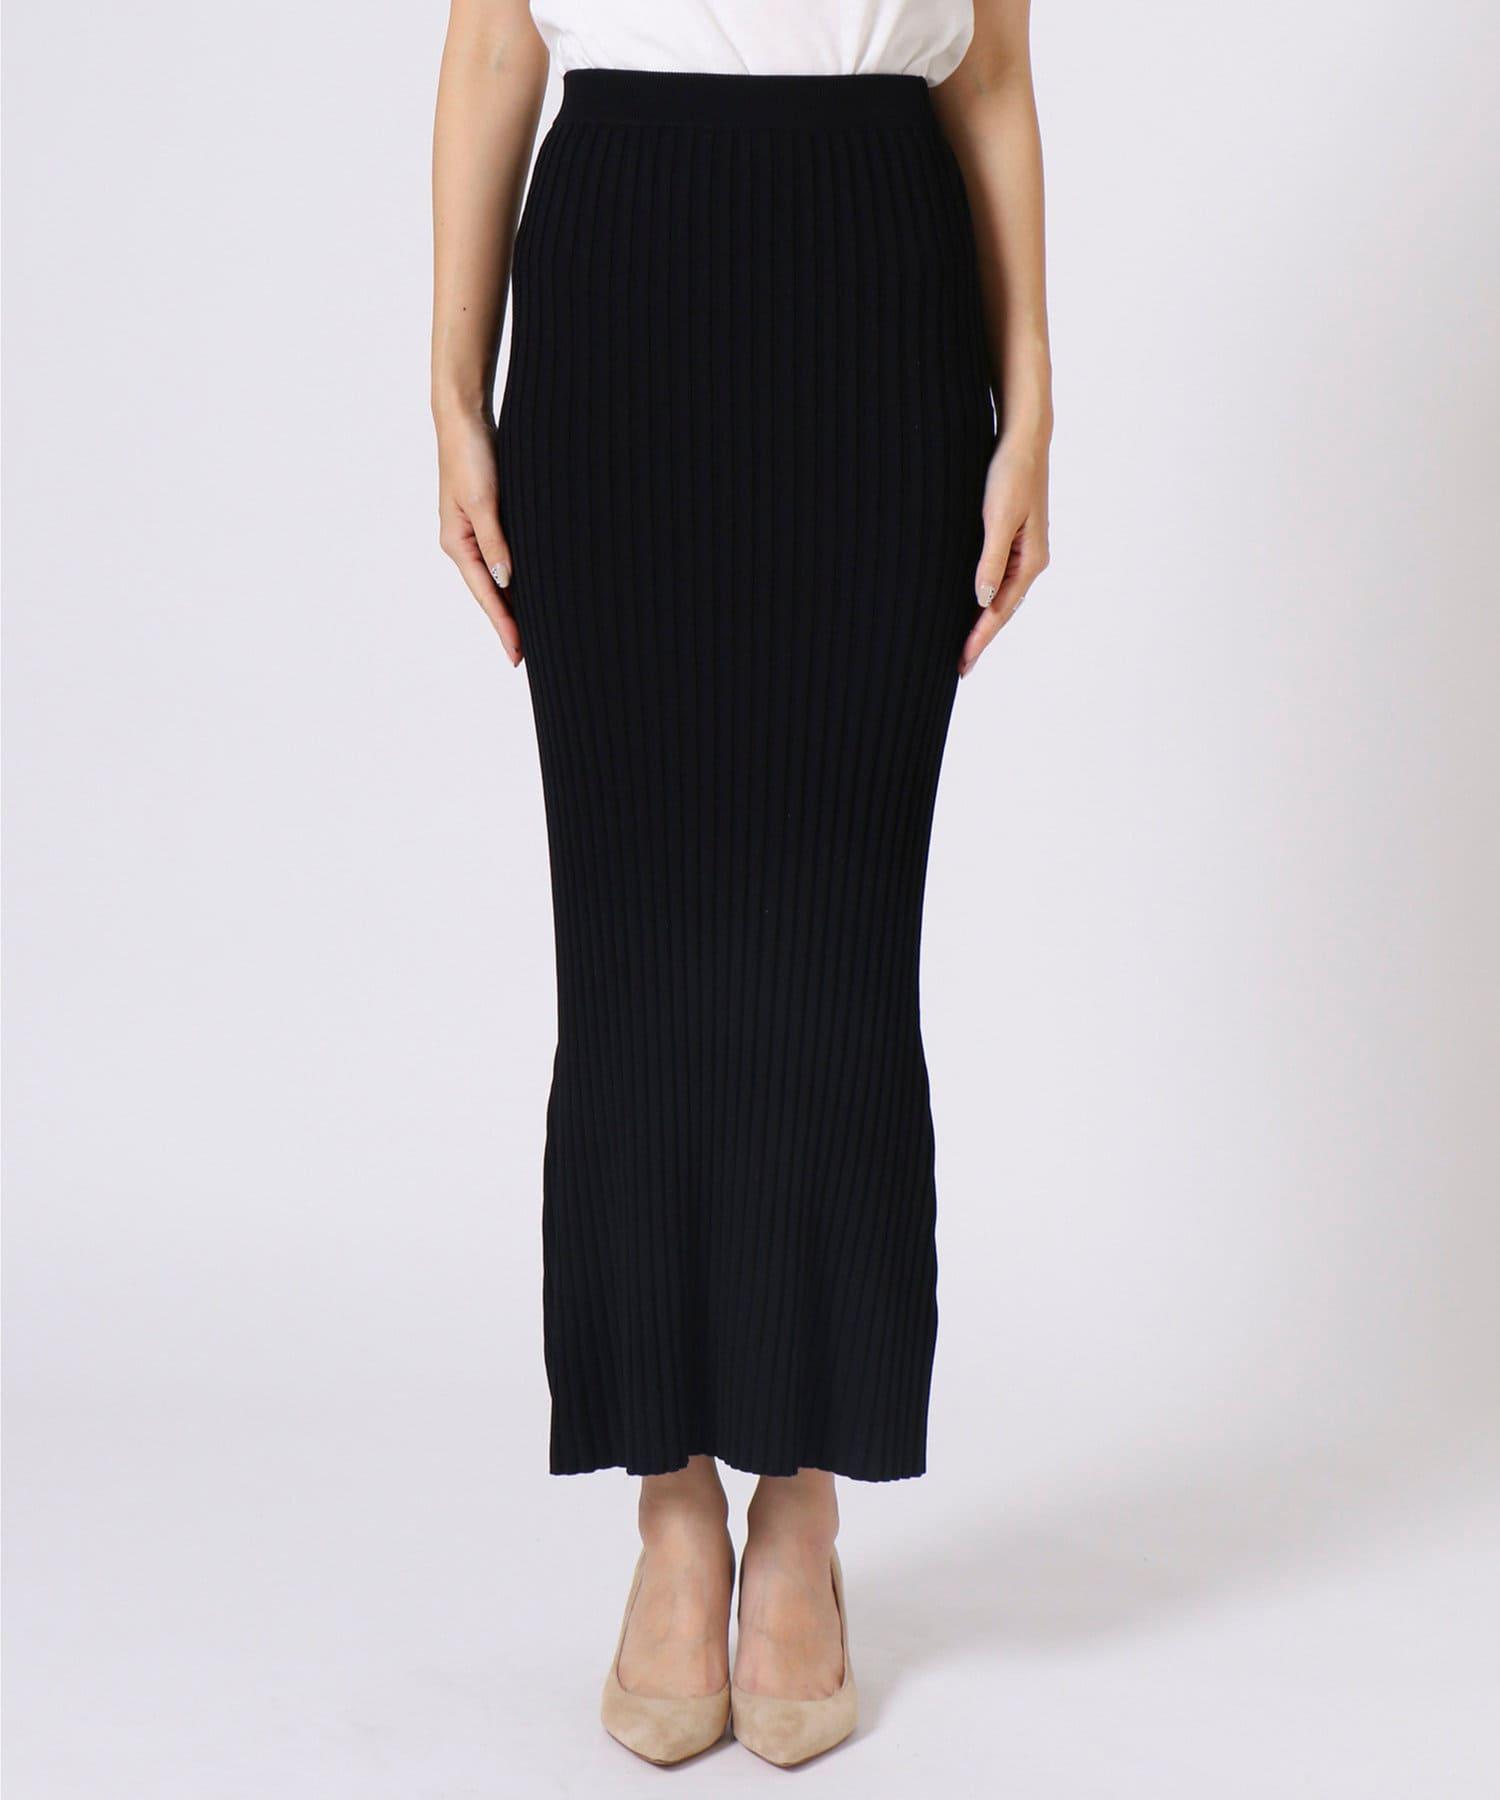 Whim Gazette(ウィム ガゼット) ニットフィットスカート